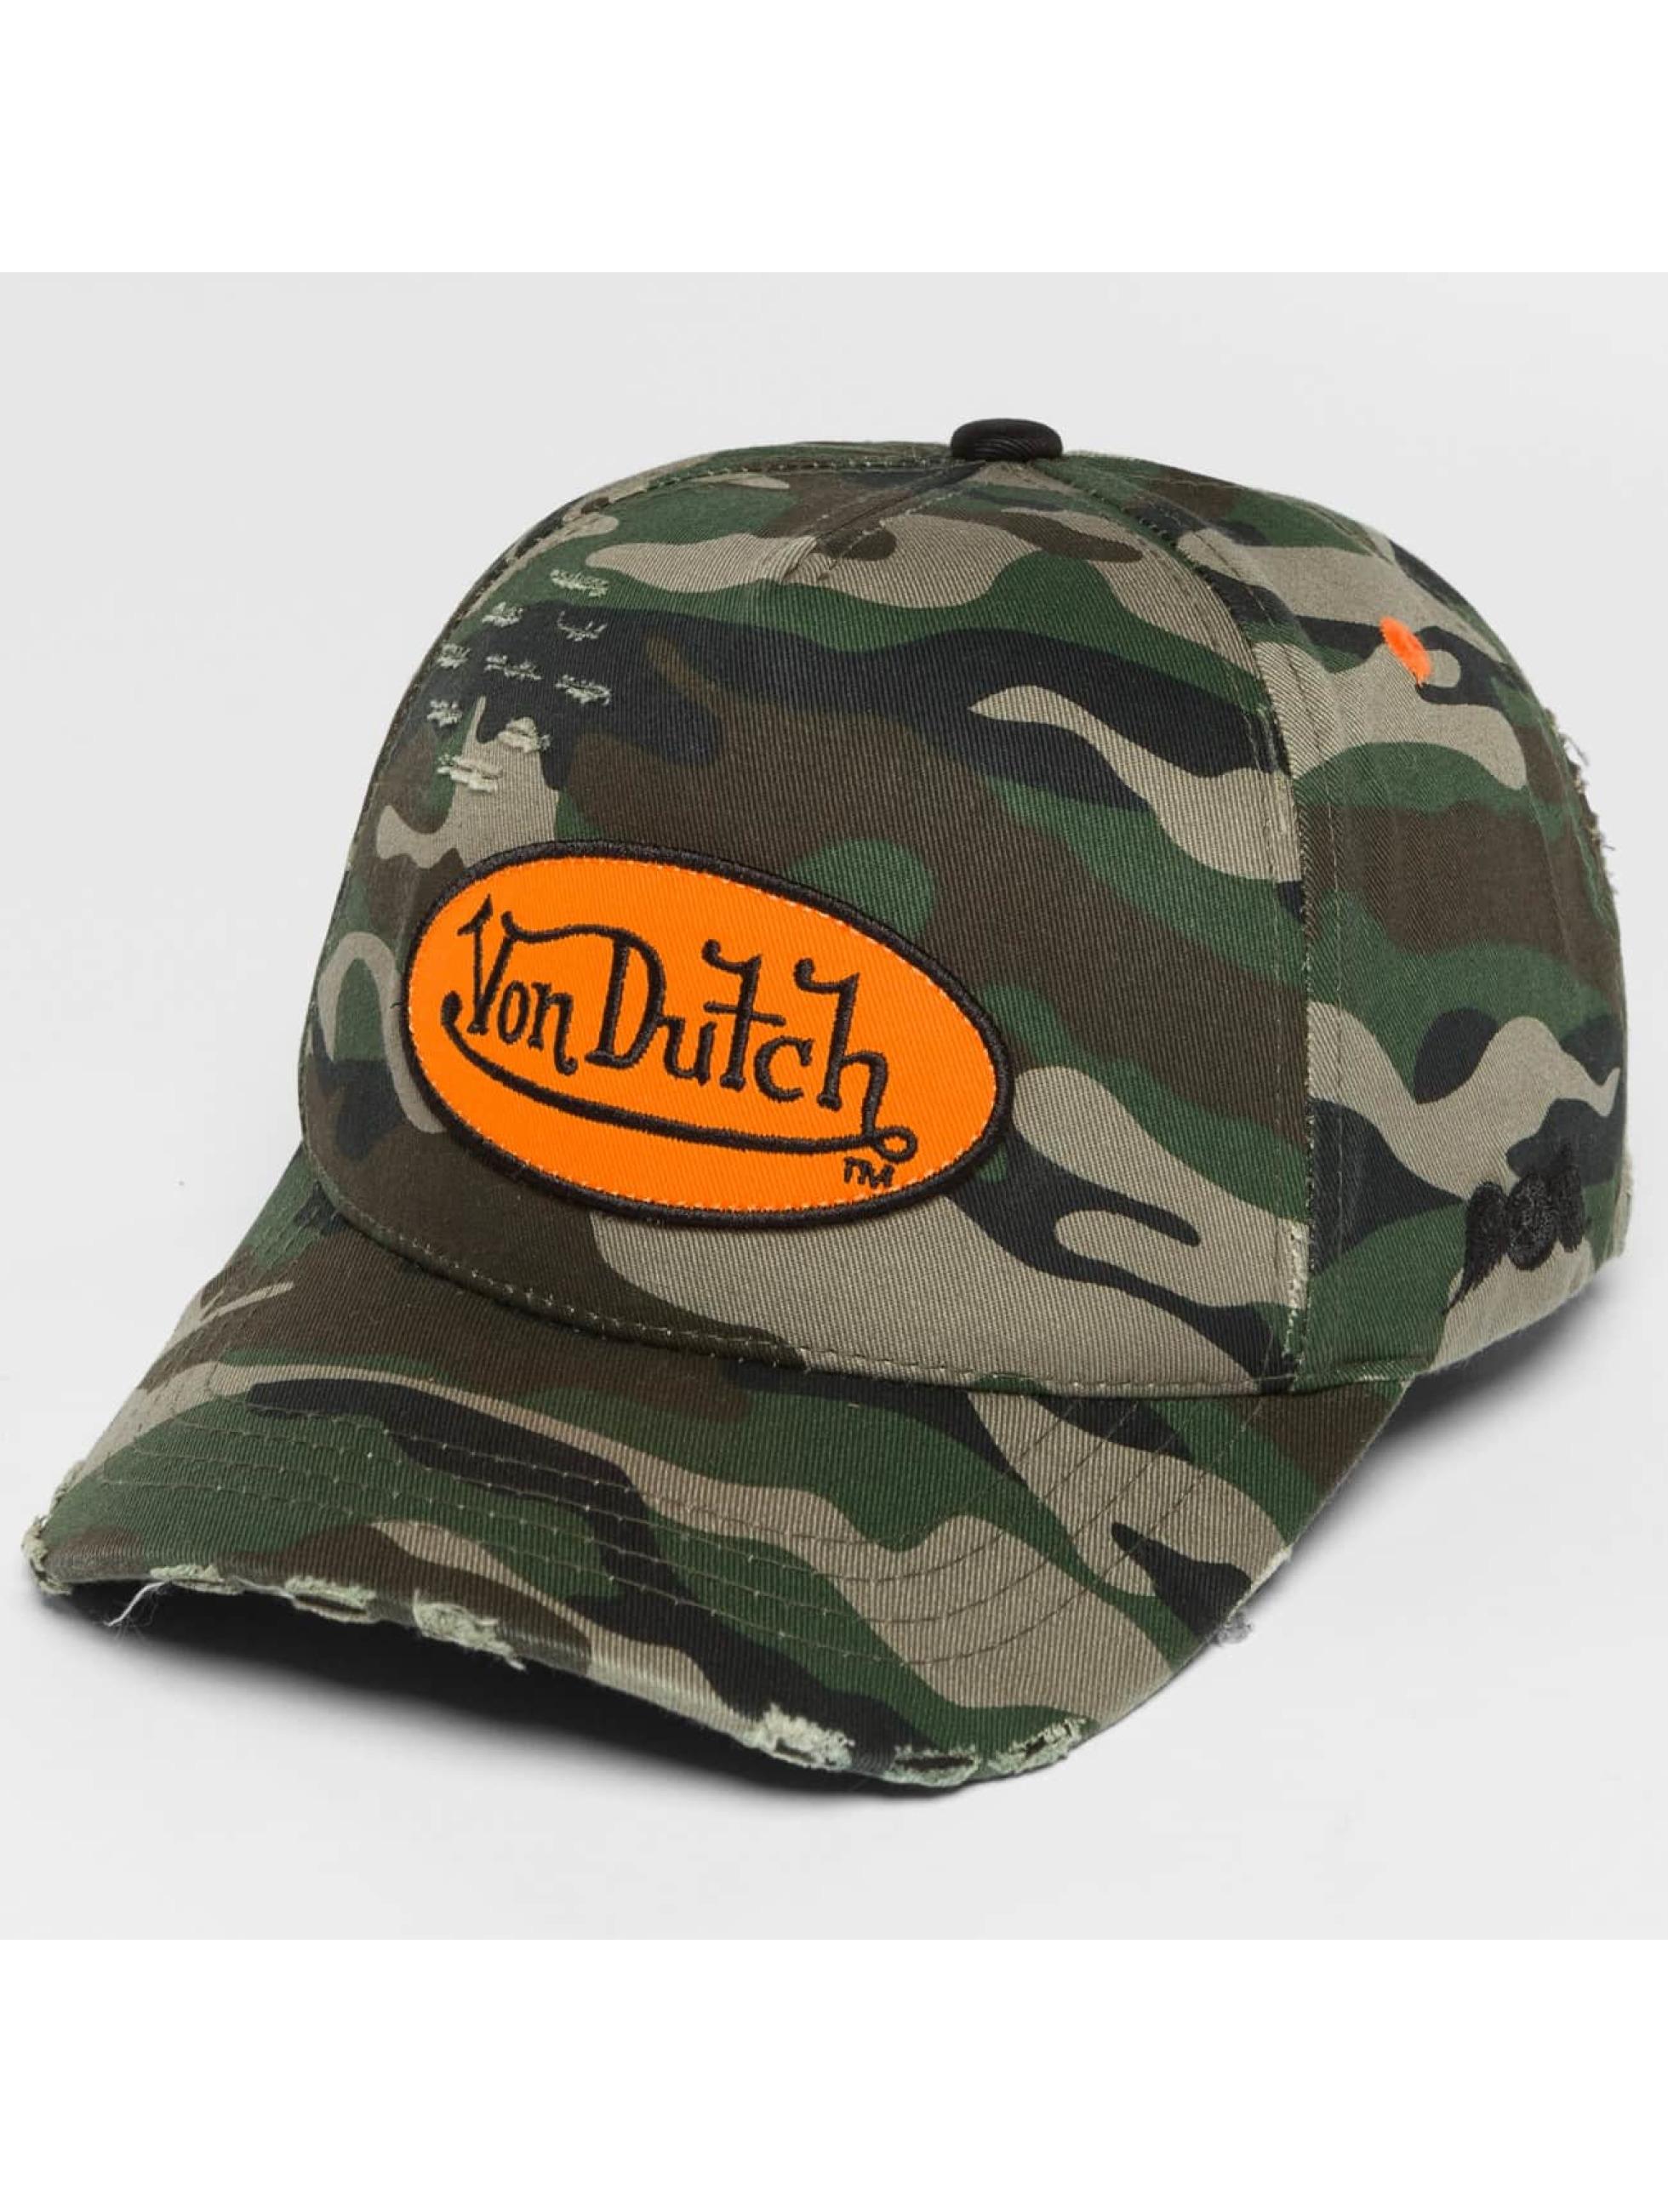 Von Dutch Snapback Caps Camo Destroyed kamuflasje